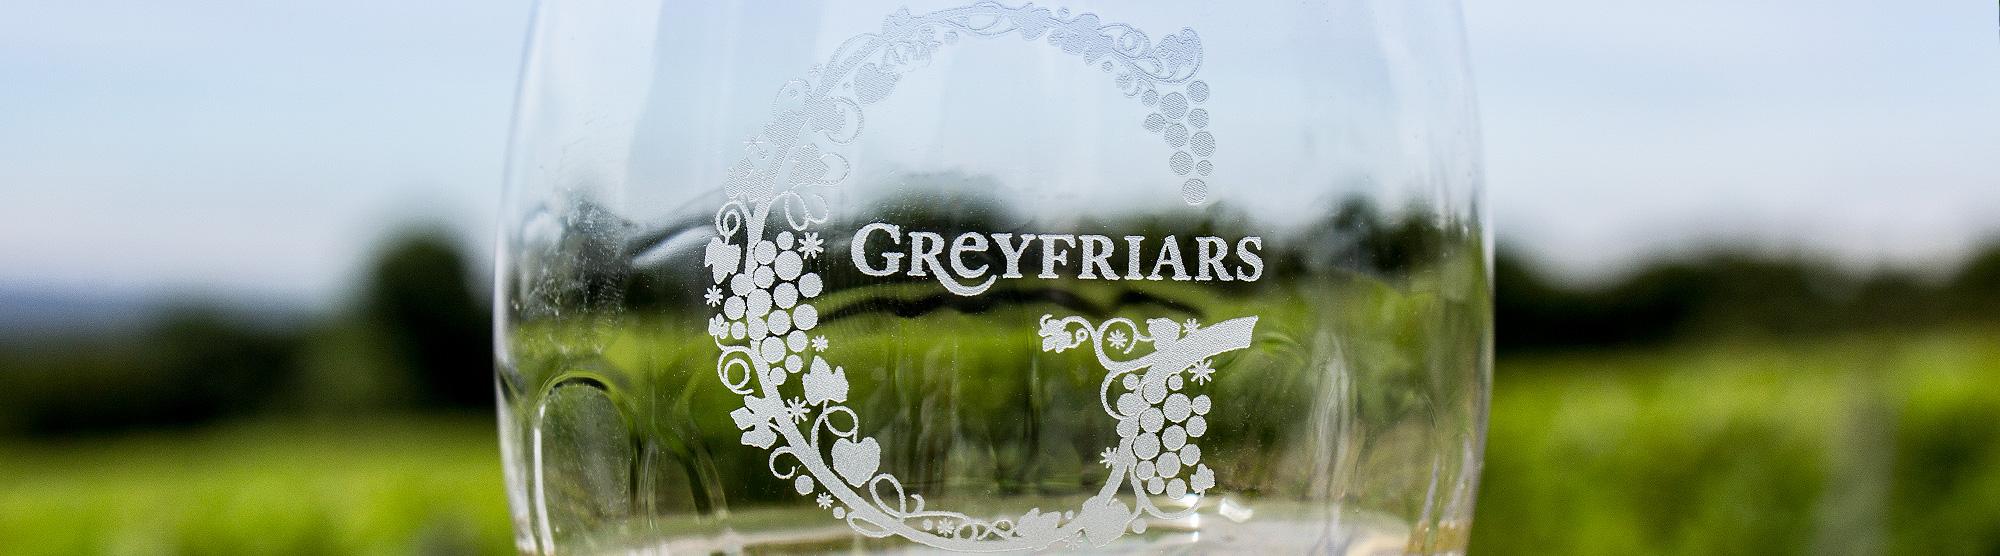 banner_greyfriars2016